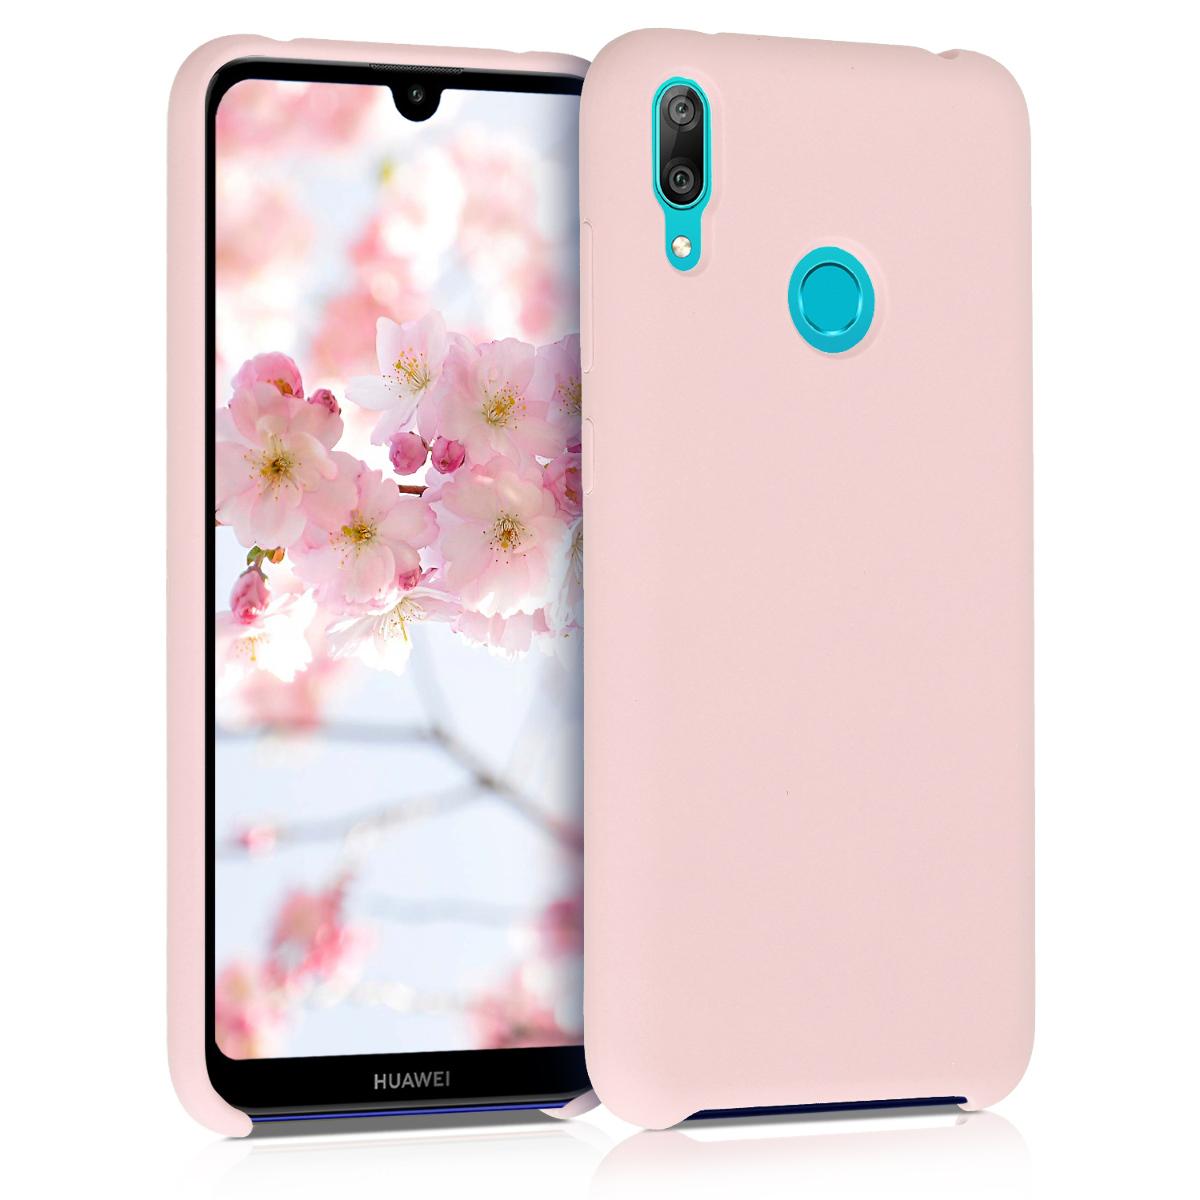 KW Θήκη Σιλικόνης Huawei Y7 2019 / Y7 Prime 2019 - Soft Flexible Rubber - Dusty Pink (50686.10)